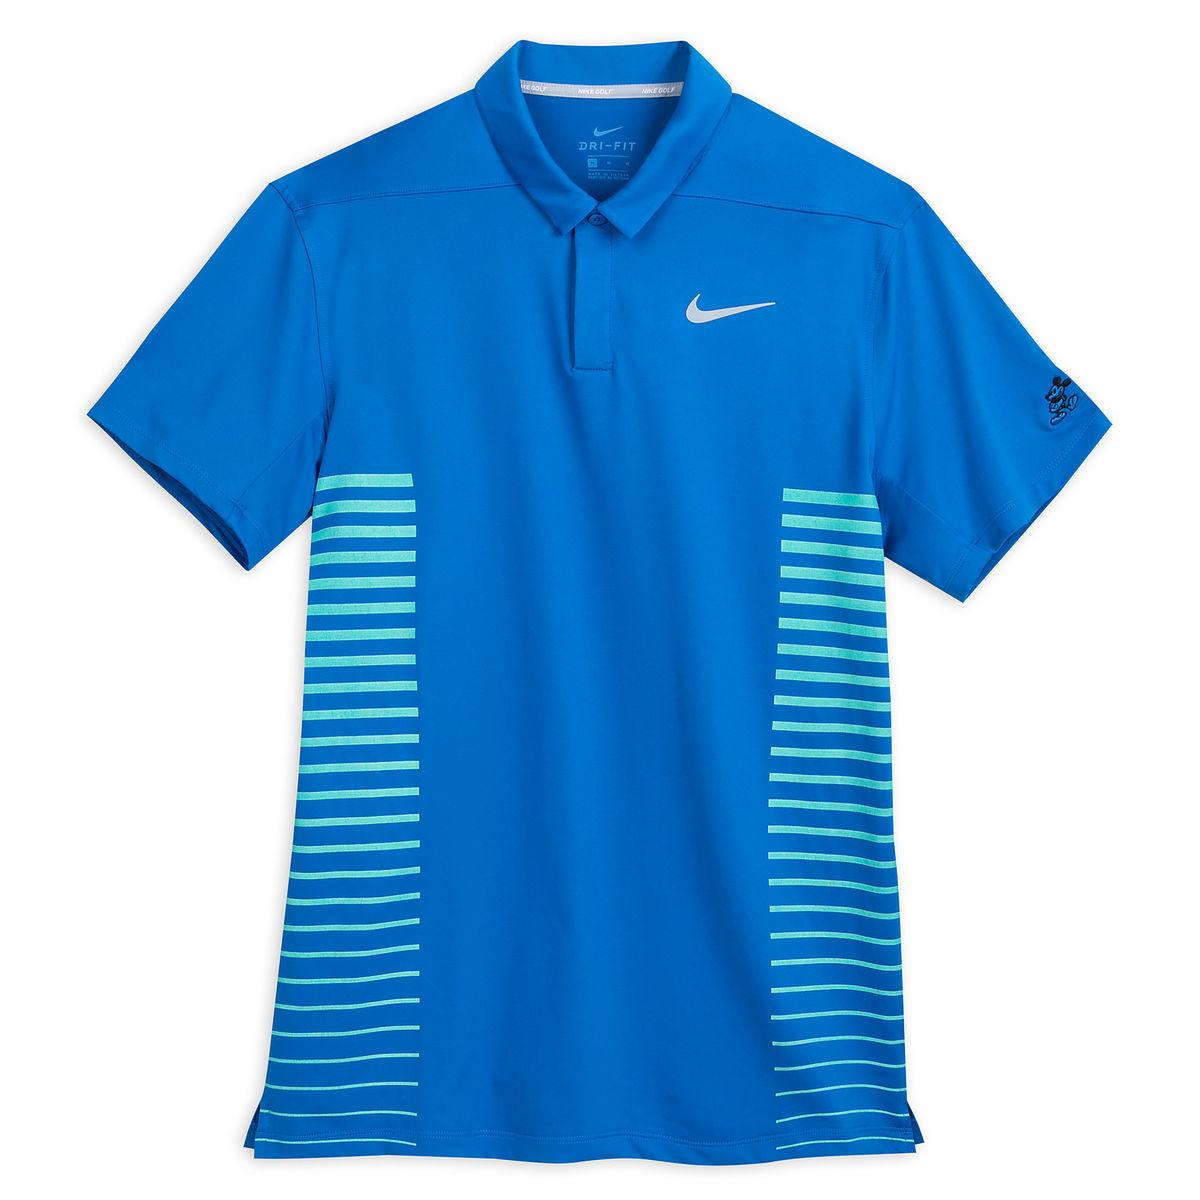 Men - Nike Golf Mickey Mouse - Blue